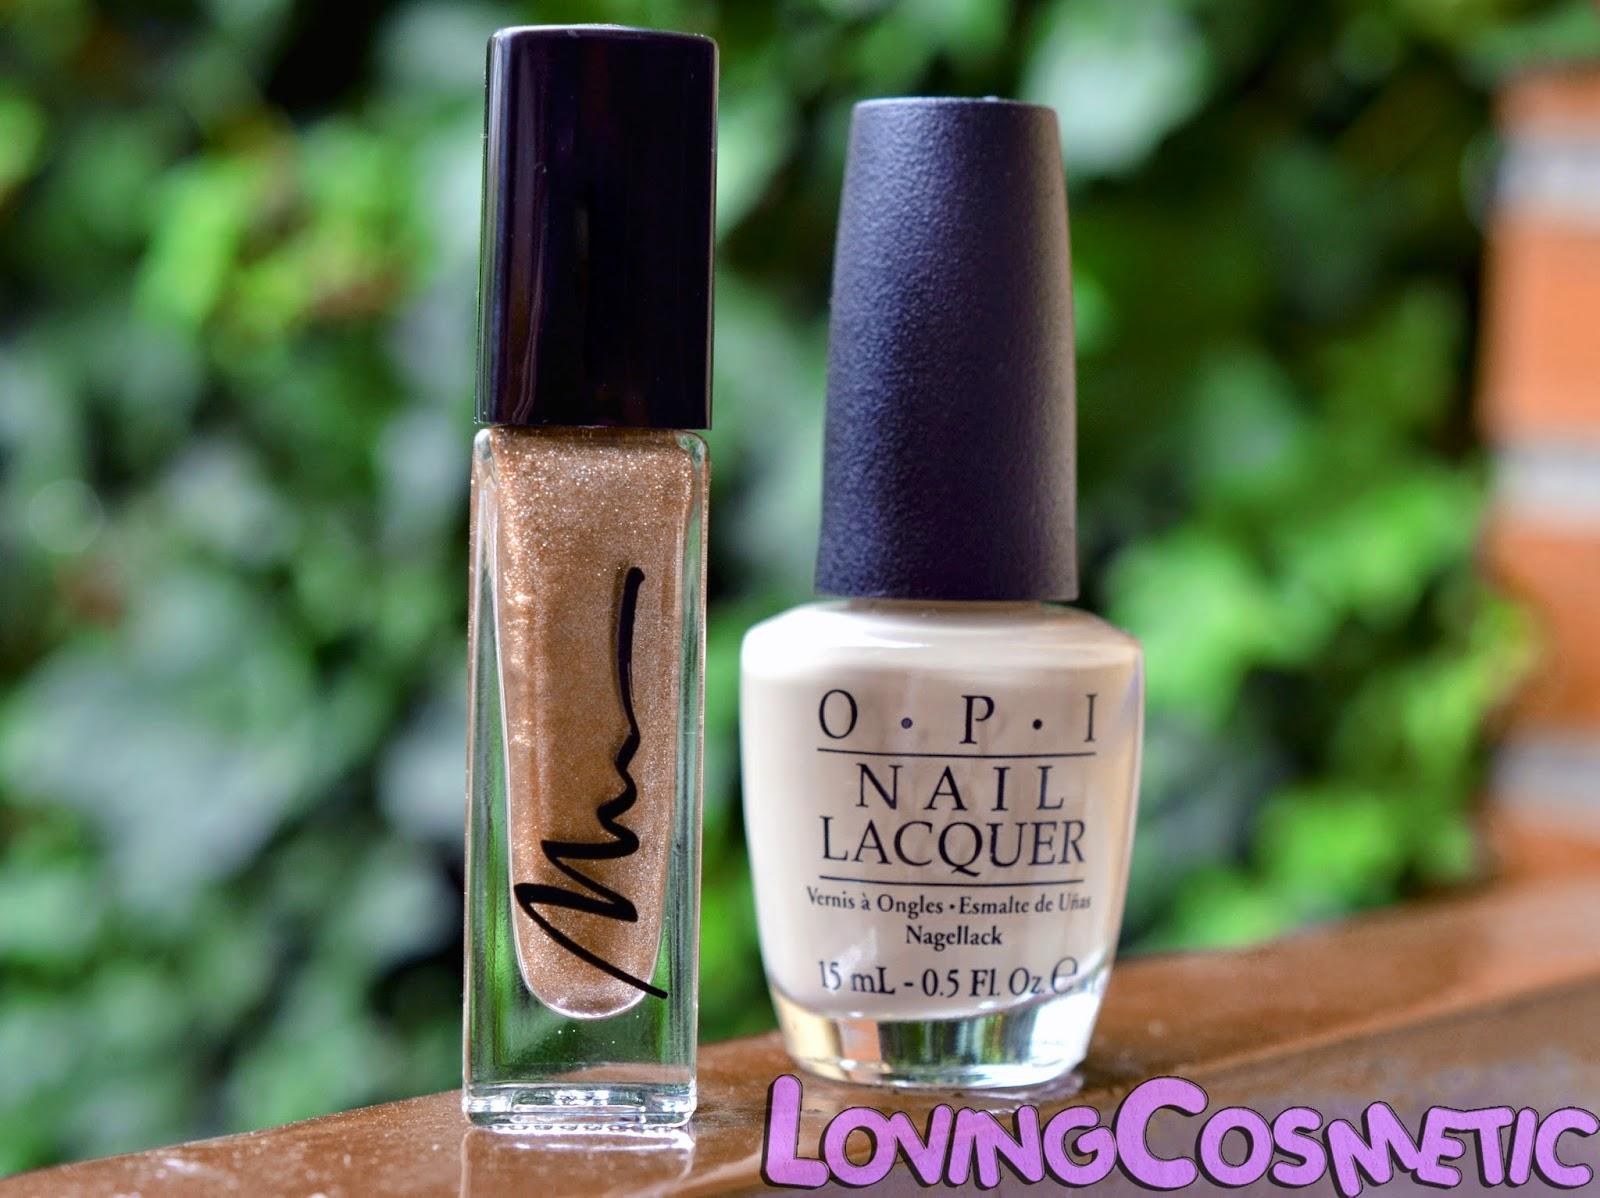 OPI Nail Art Vain-illa Vainilla Uñas diseño de uñas dorado navidad cute fino elegante easy facil nail art  marionnaud nails